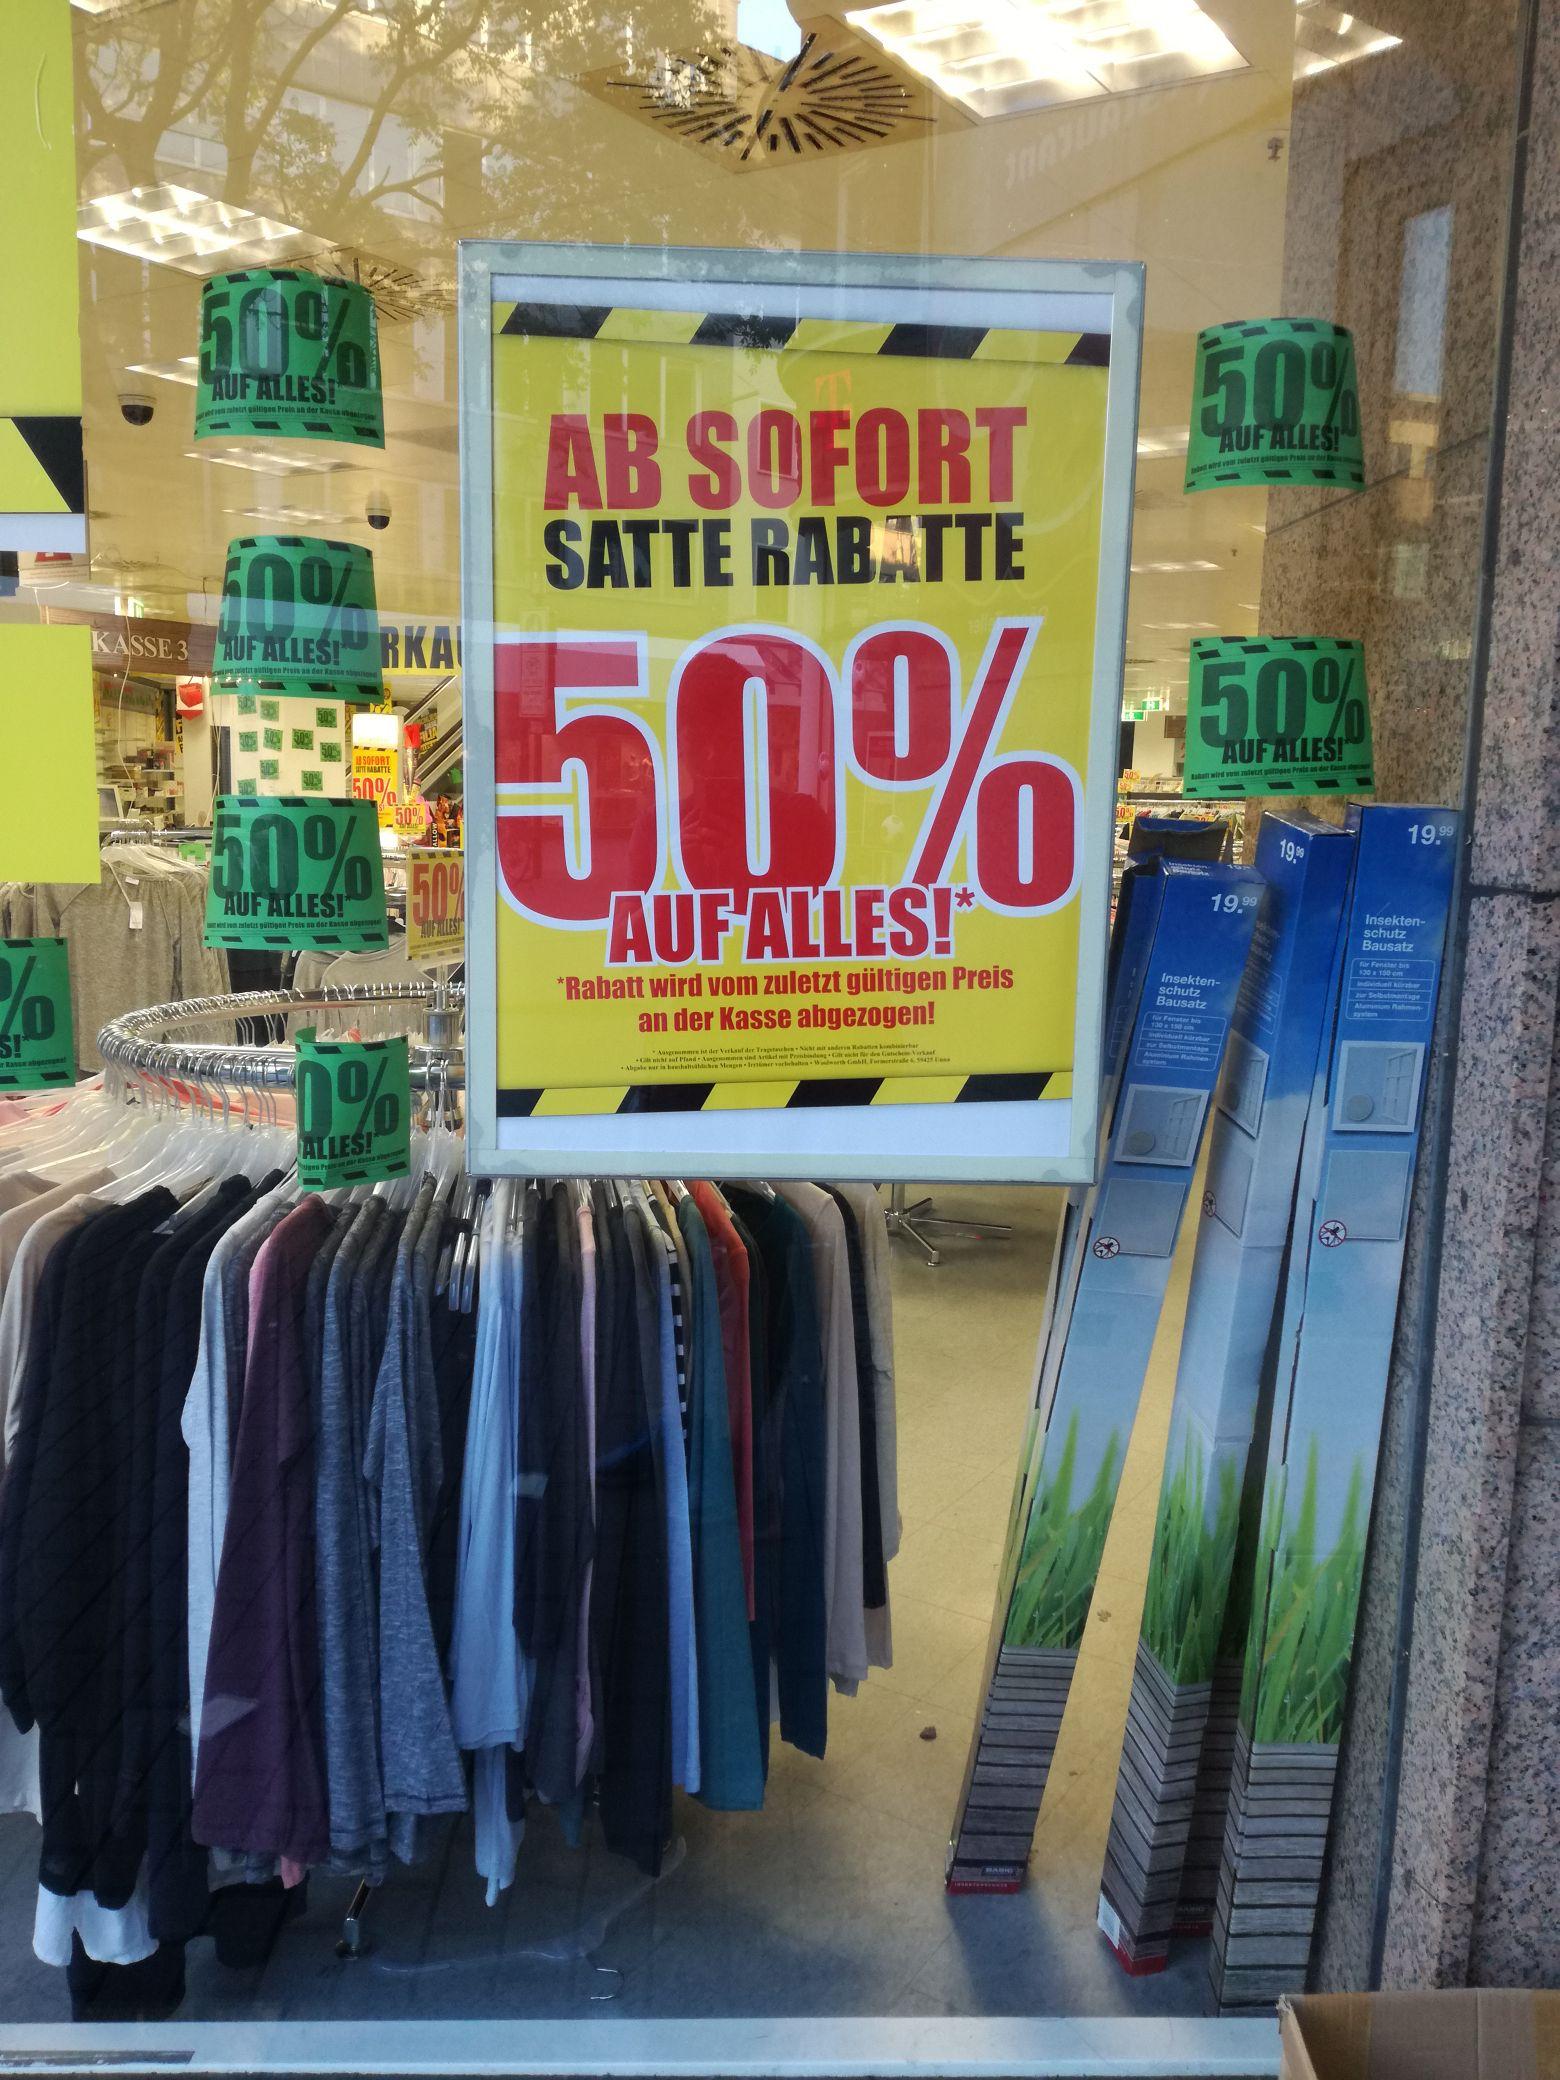 [Lokal Hamm] Woolworth 50% auf alles!